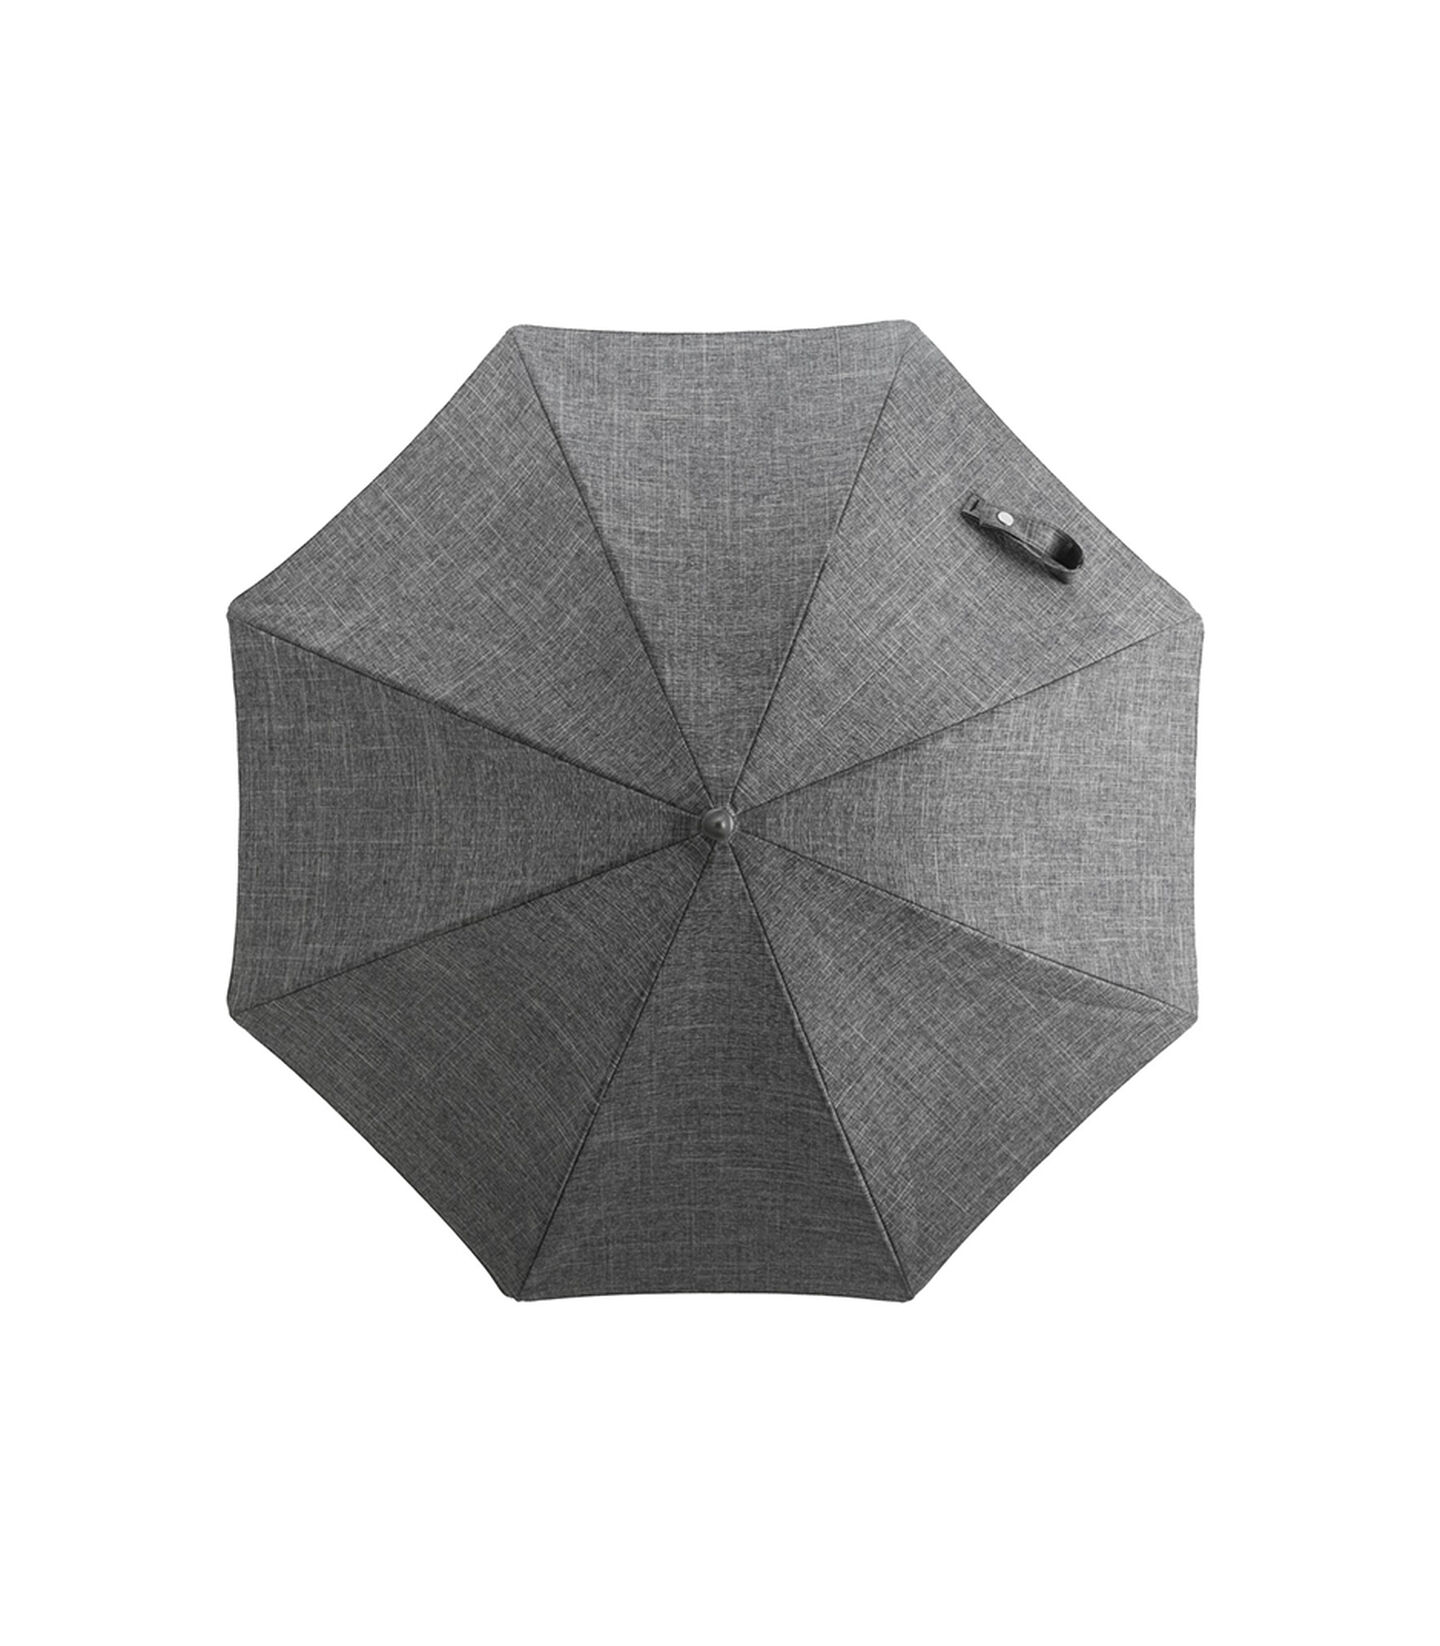 Stokke® Xplory® Black Parasol Black Melange, Black Melange, mainview view 2